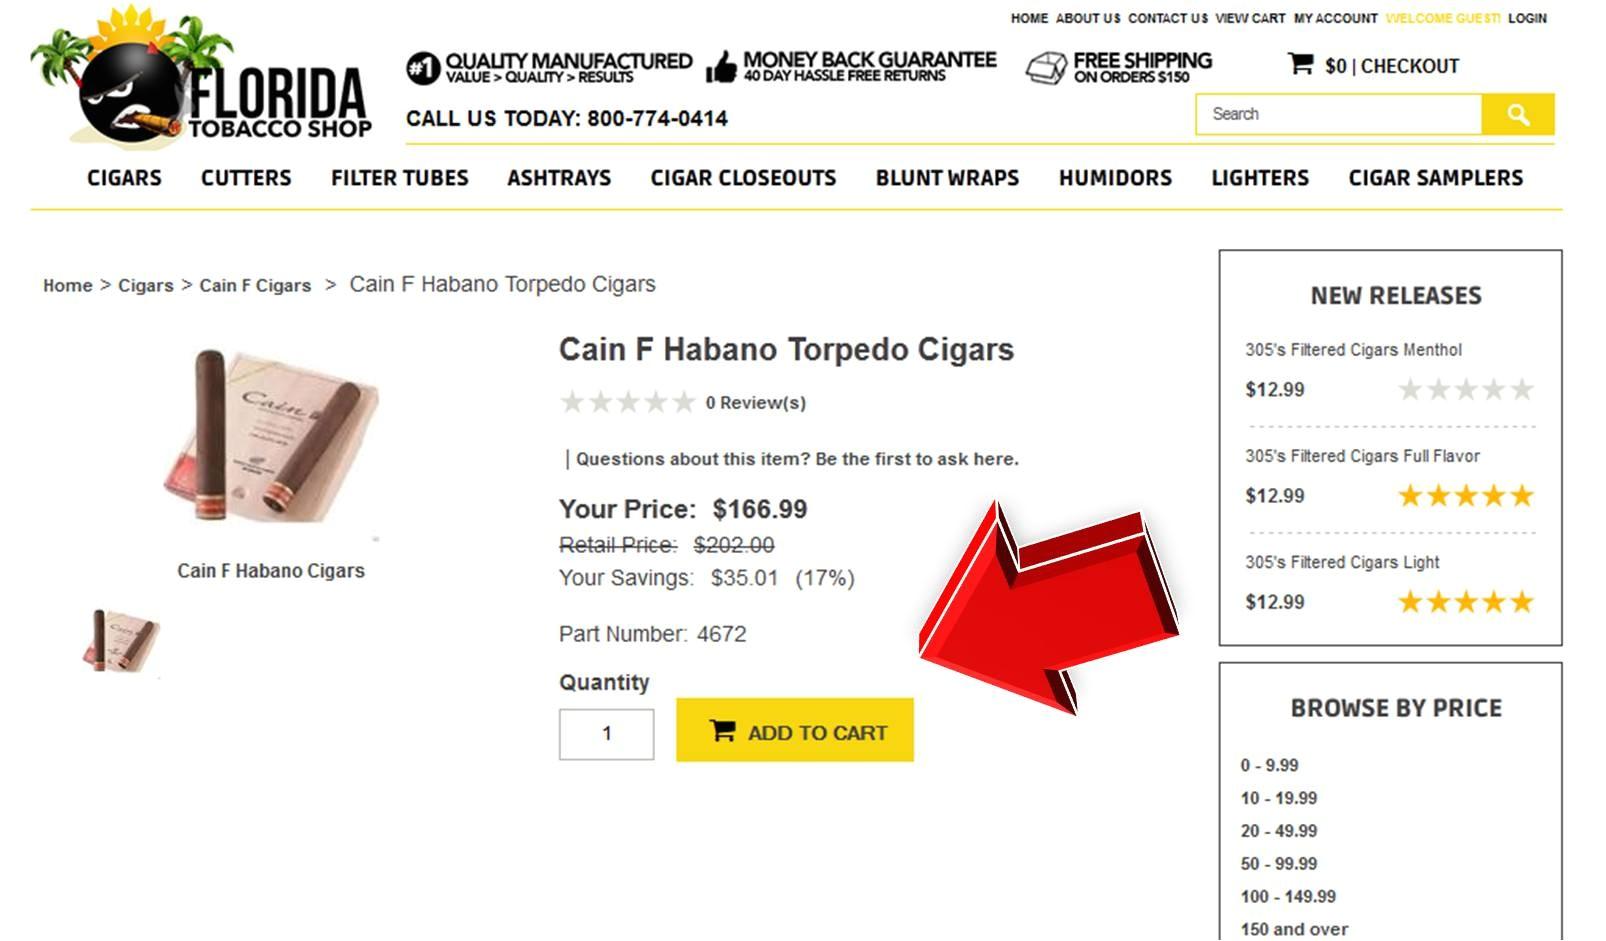 Smokers Outlet Online Coupon Code Floridatobaccoshop Coupon Code Coupon Code